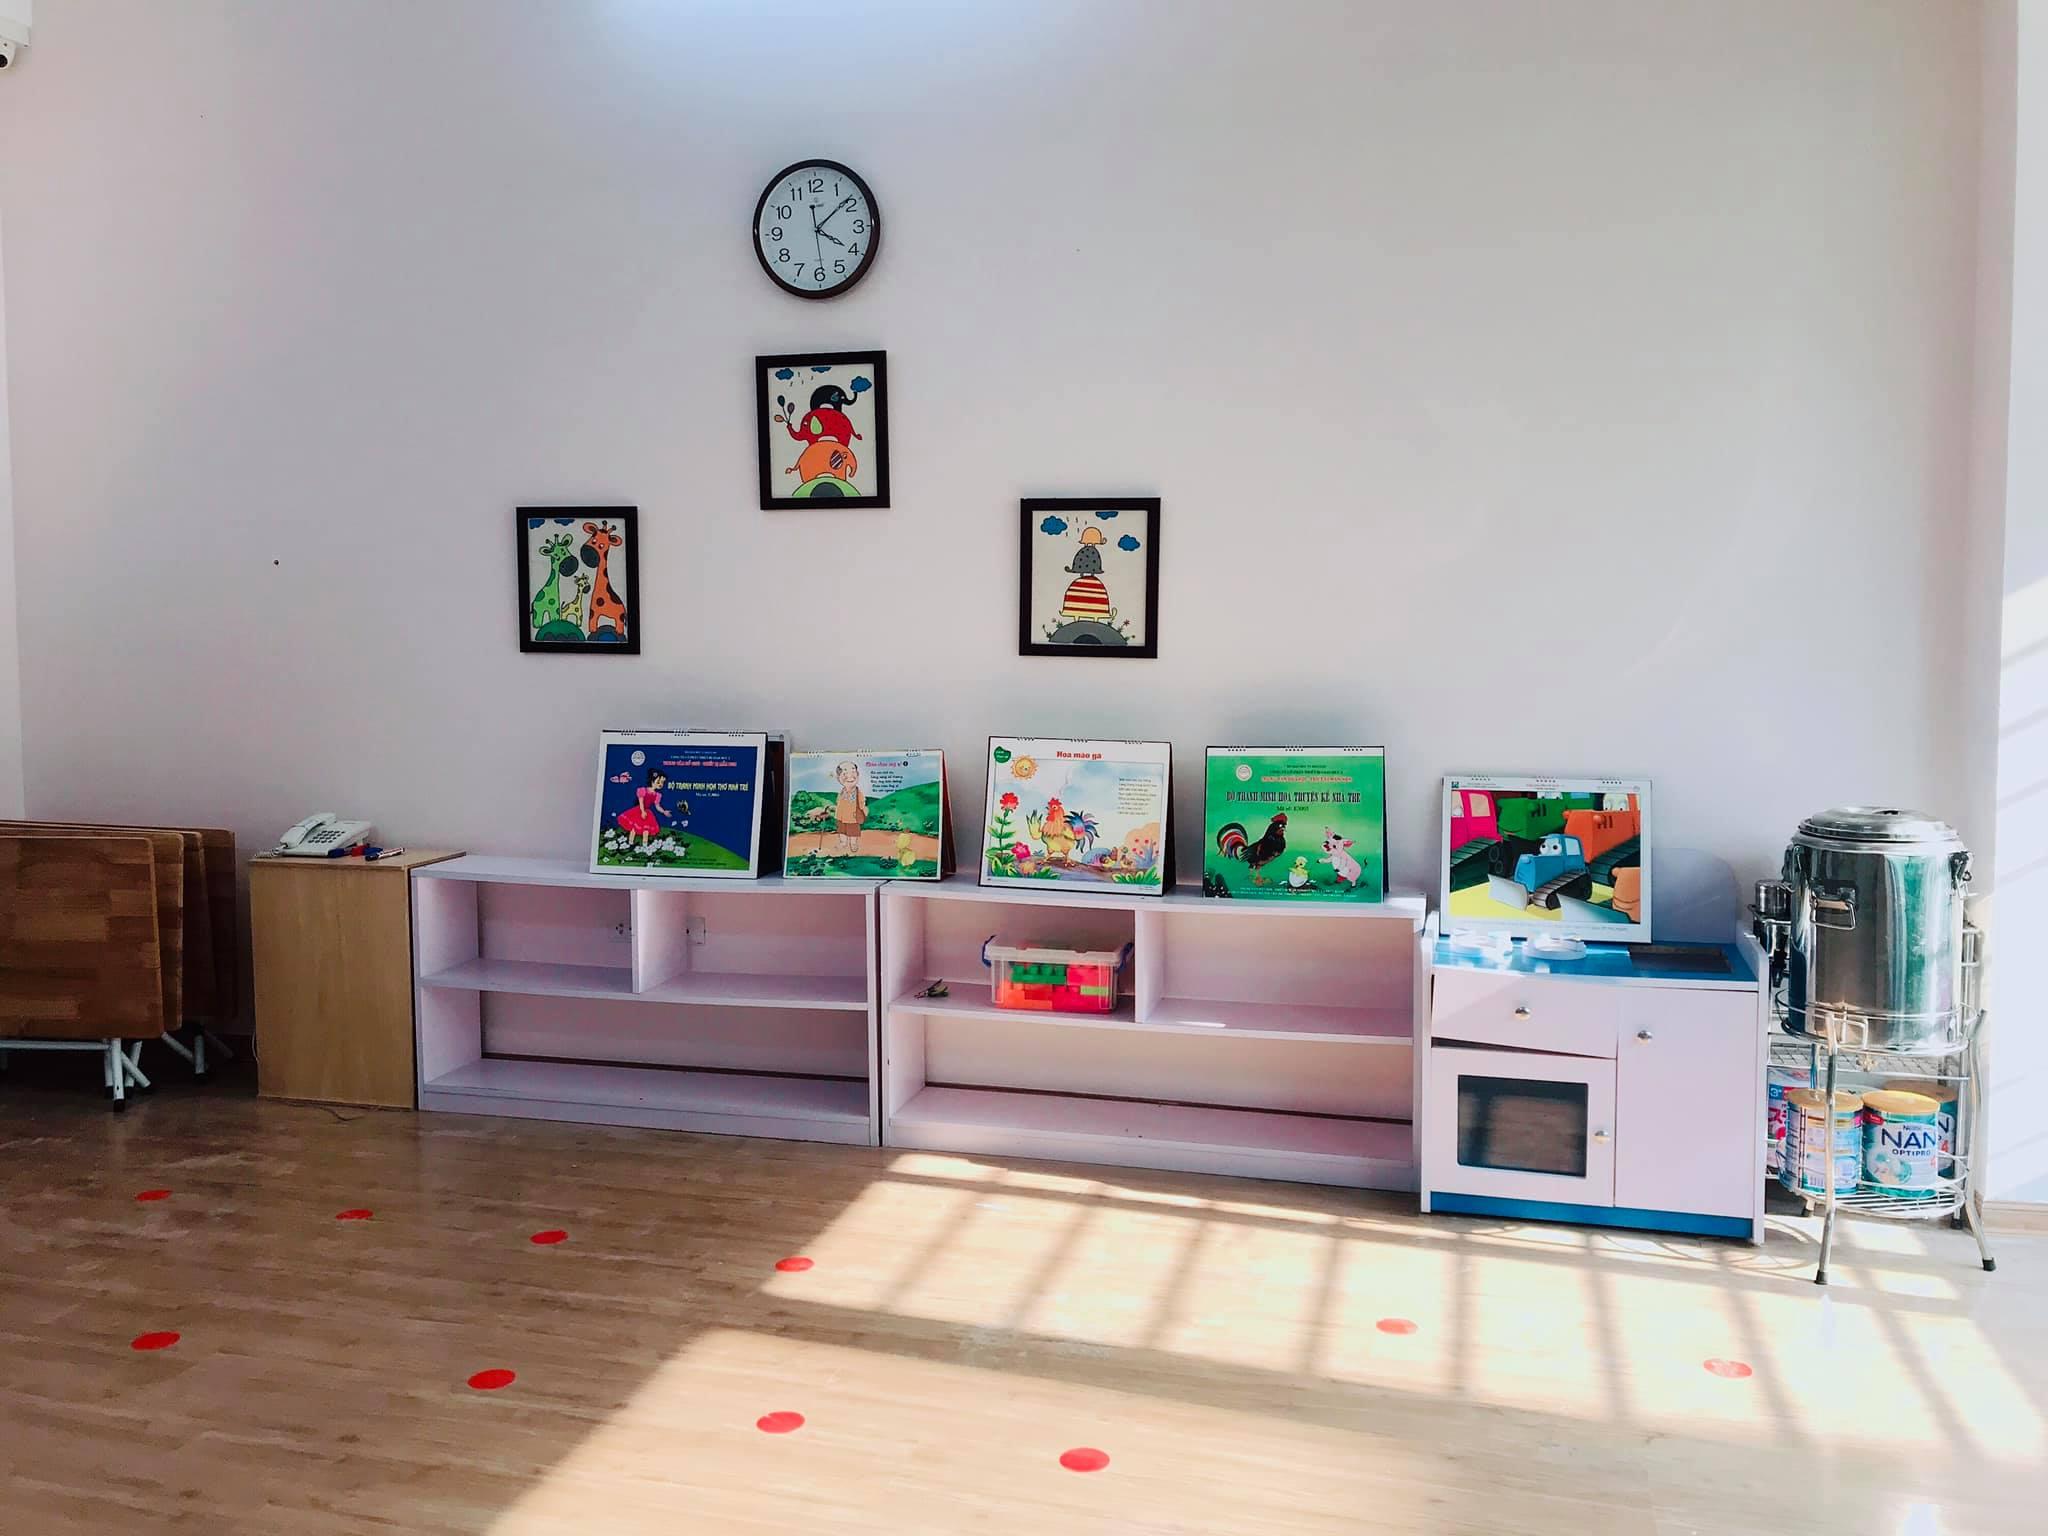 Trường mầm non Cầu Vồng  (Rainbow Montessori Kindergarten) - Minh Khai